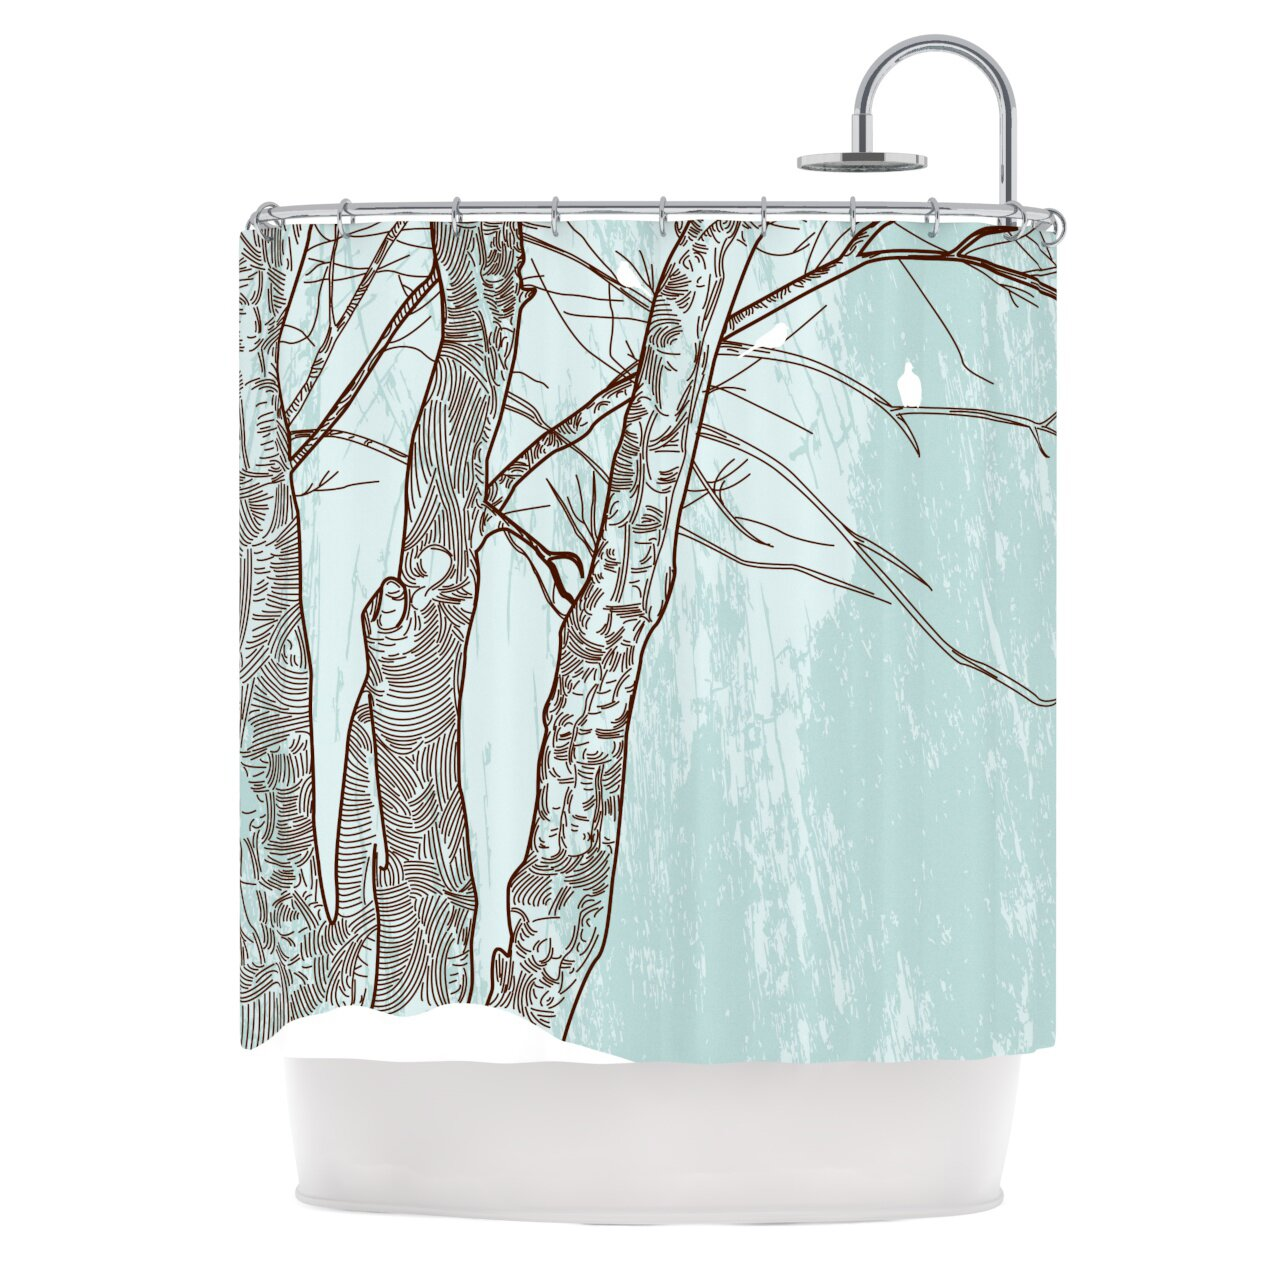 Kess Inhouse Winter Trees Shower Curtain Reviews Wayfair